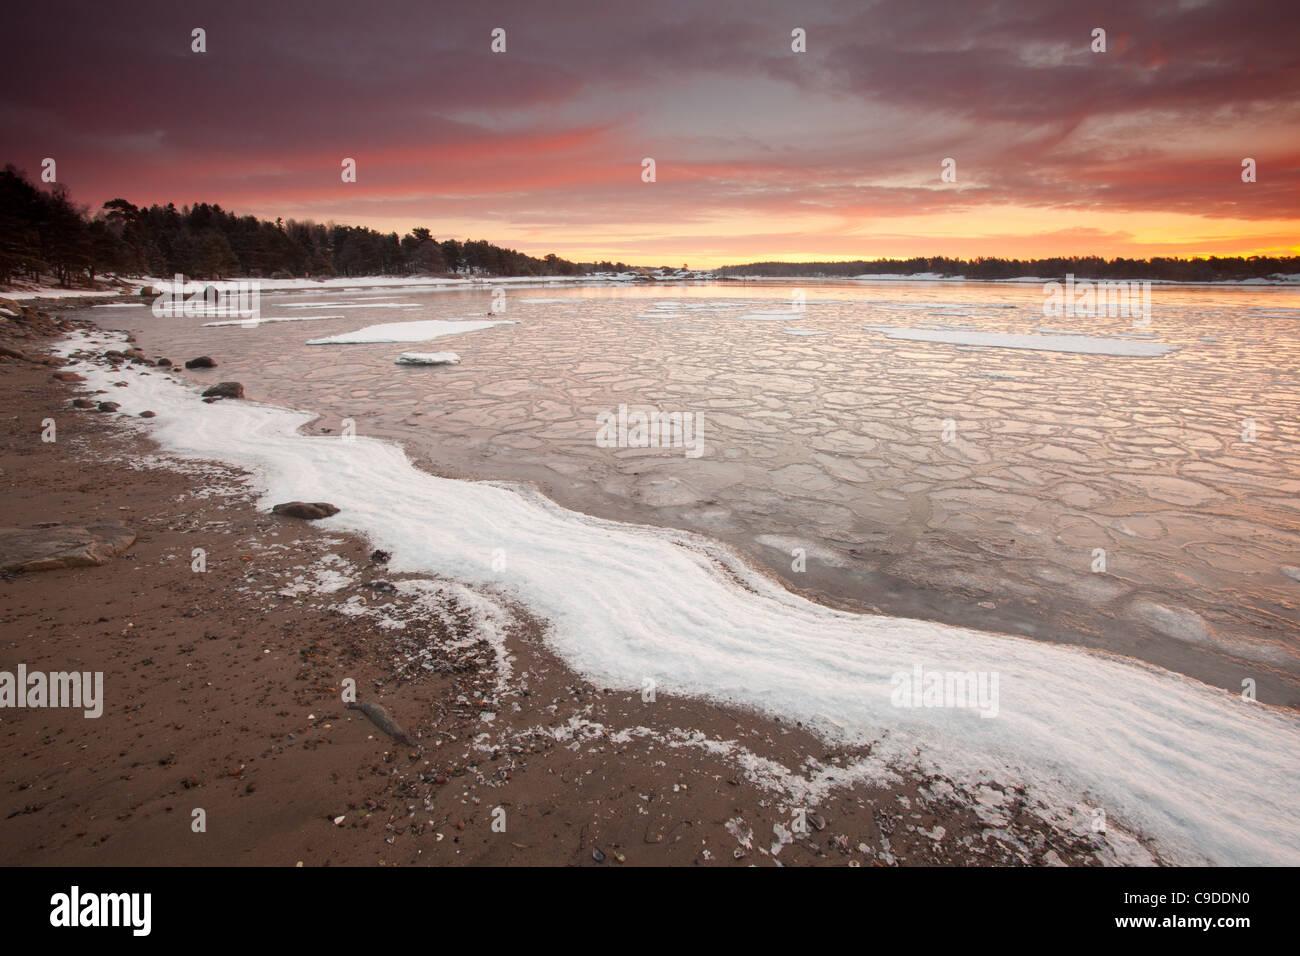 Bunte Wintermorgen am Ofen in Råde Kommune, Østfold Fylke, Norwegen. Stockfoto